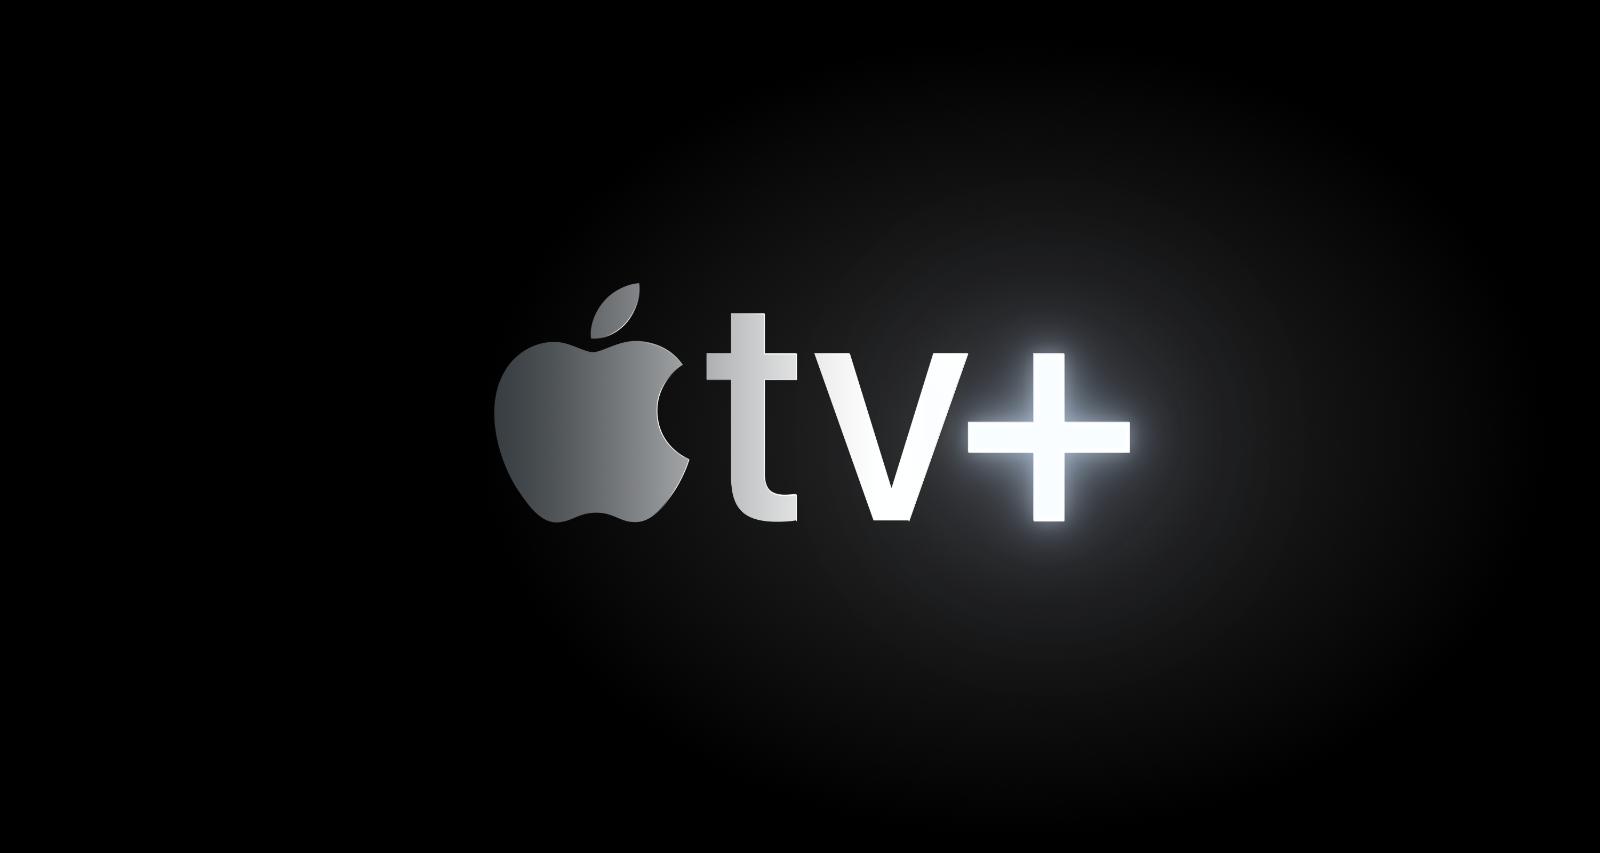 Activar 1 año gratis de Apple TV+